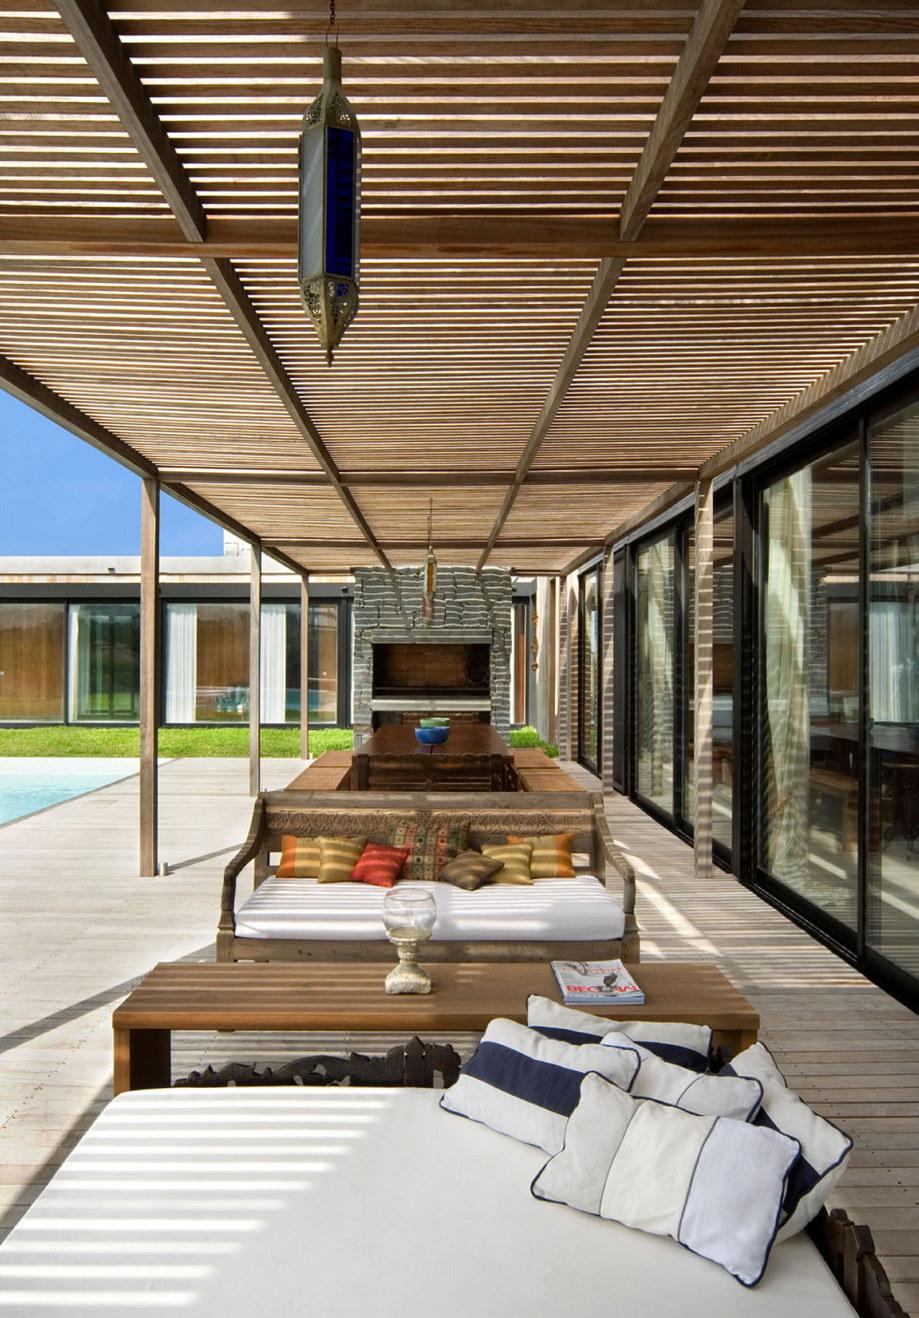 The beach house La Boyita Residence by Martin Gomez Arguitectos, Uruguay 13